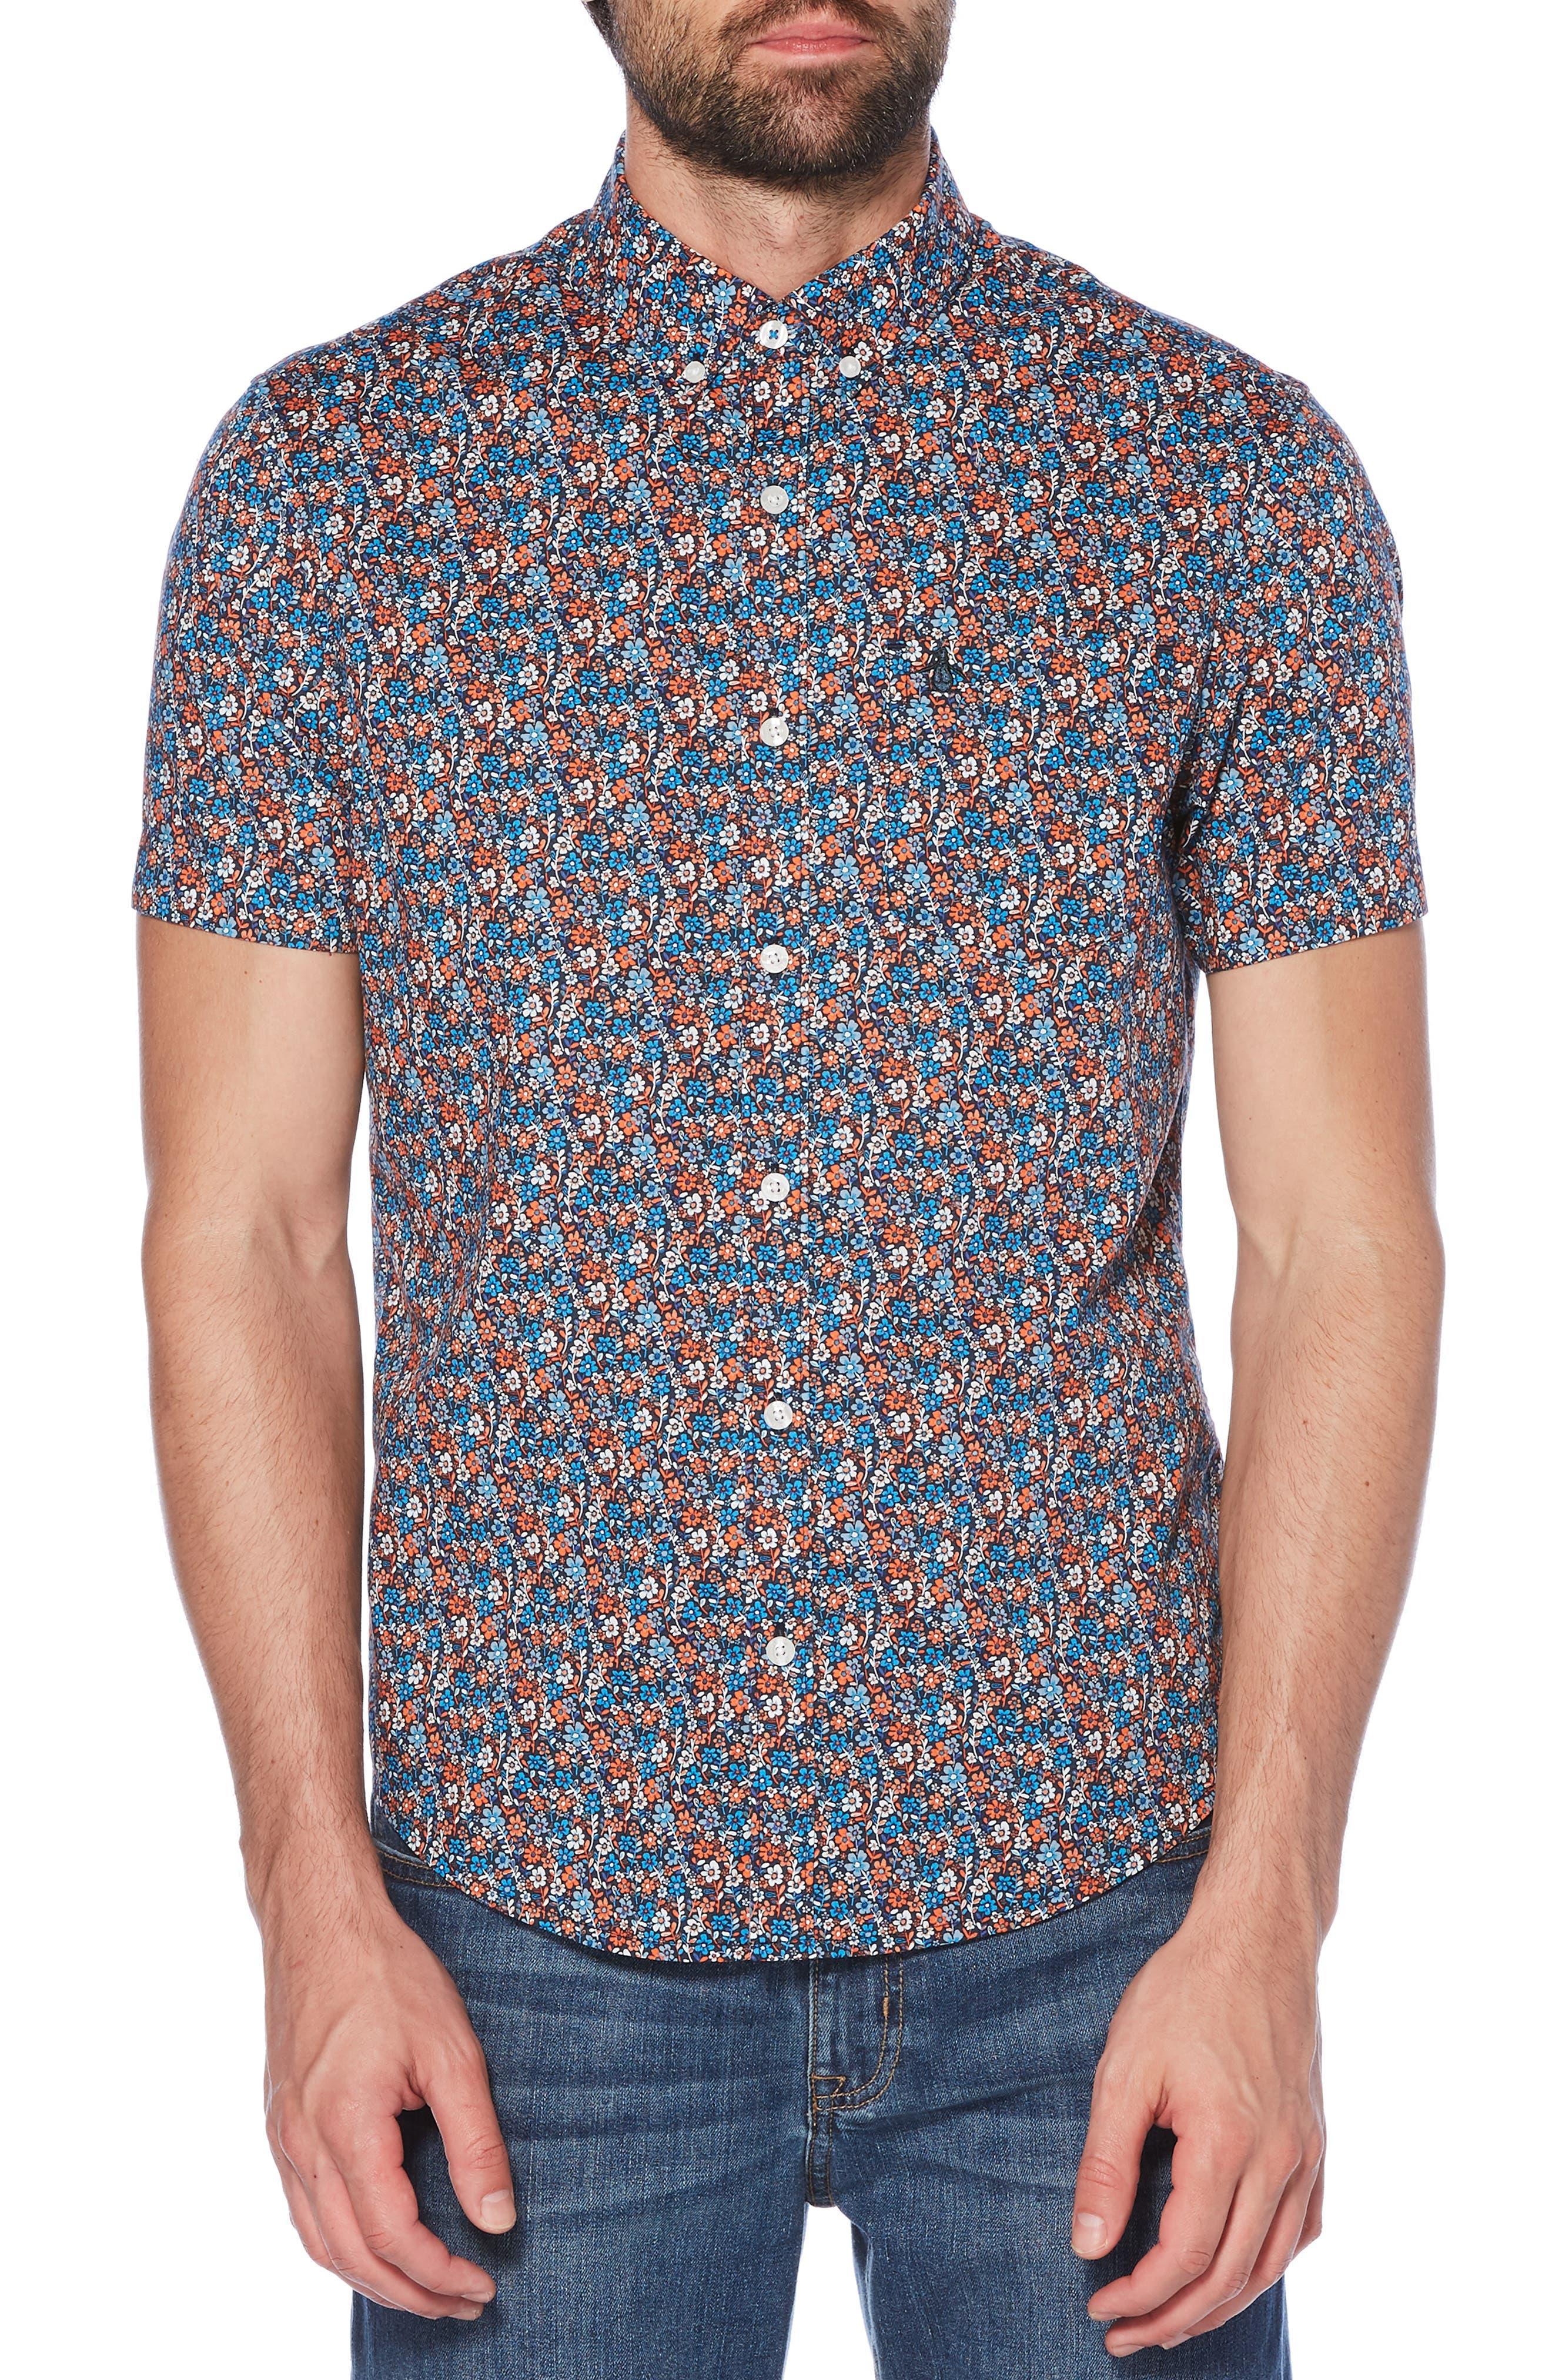 ORIGINAL PENGUIN, Ditsy Floral Print Woven Shirt, Main thumbnail 1, color, 413